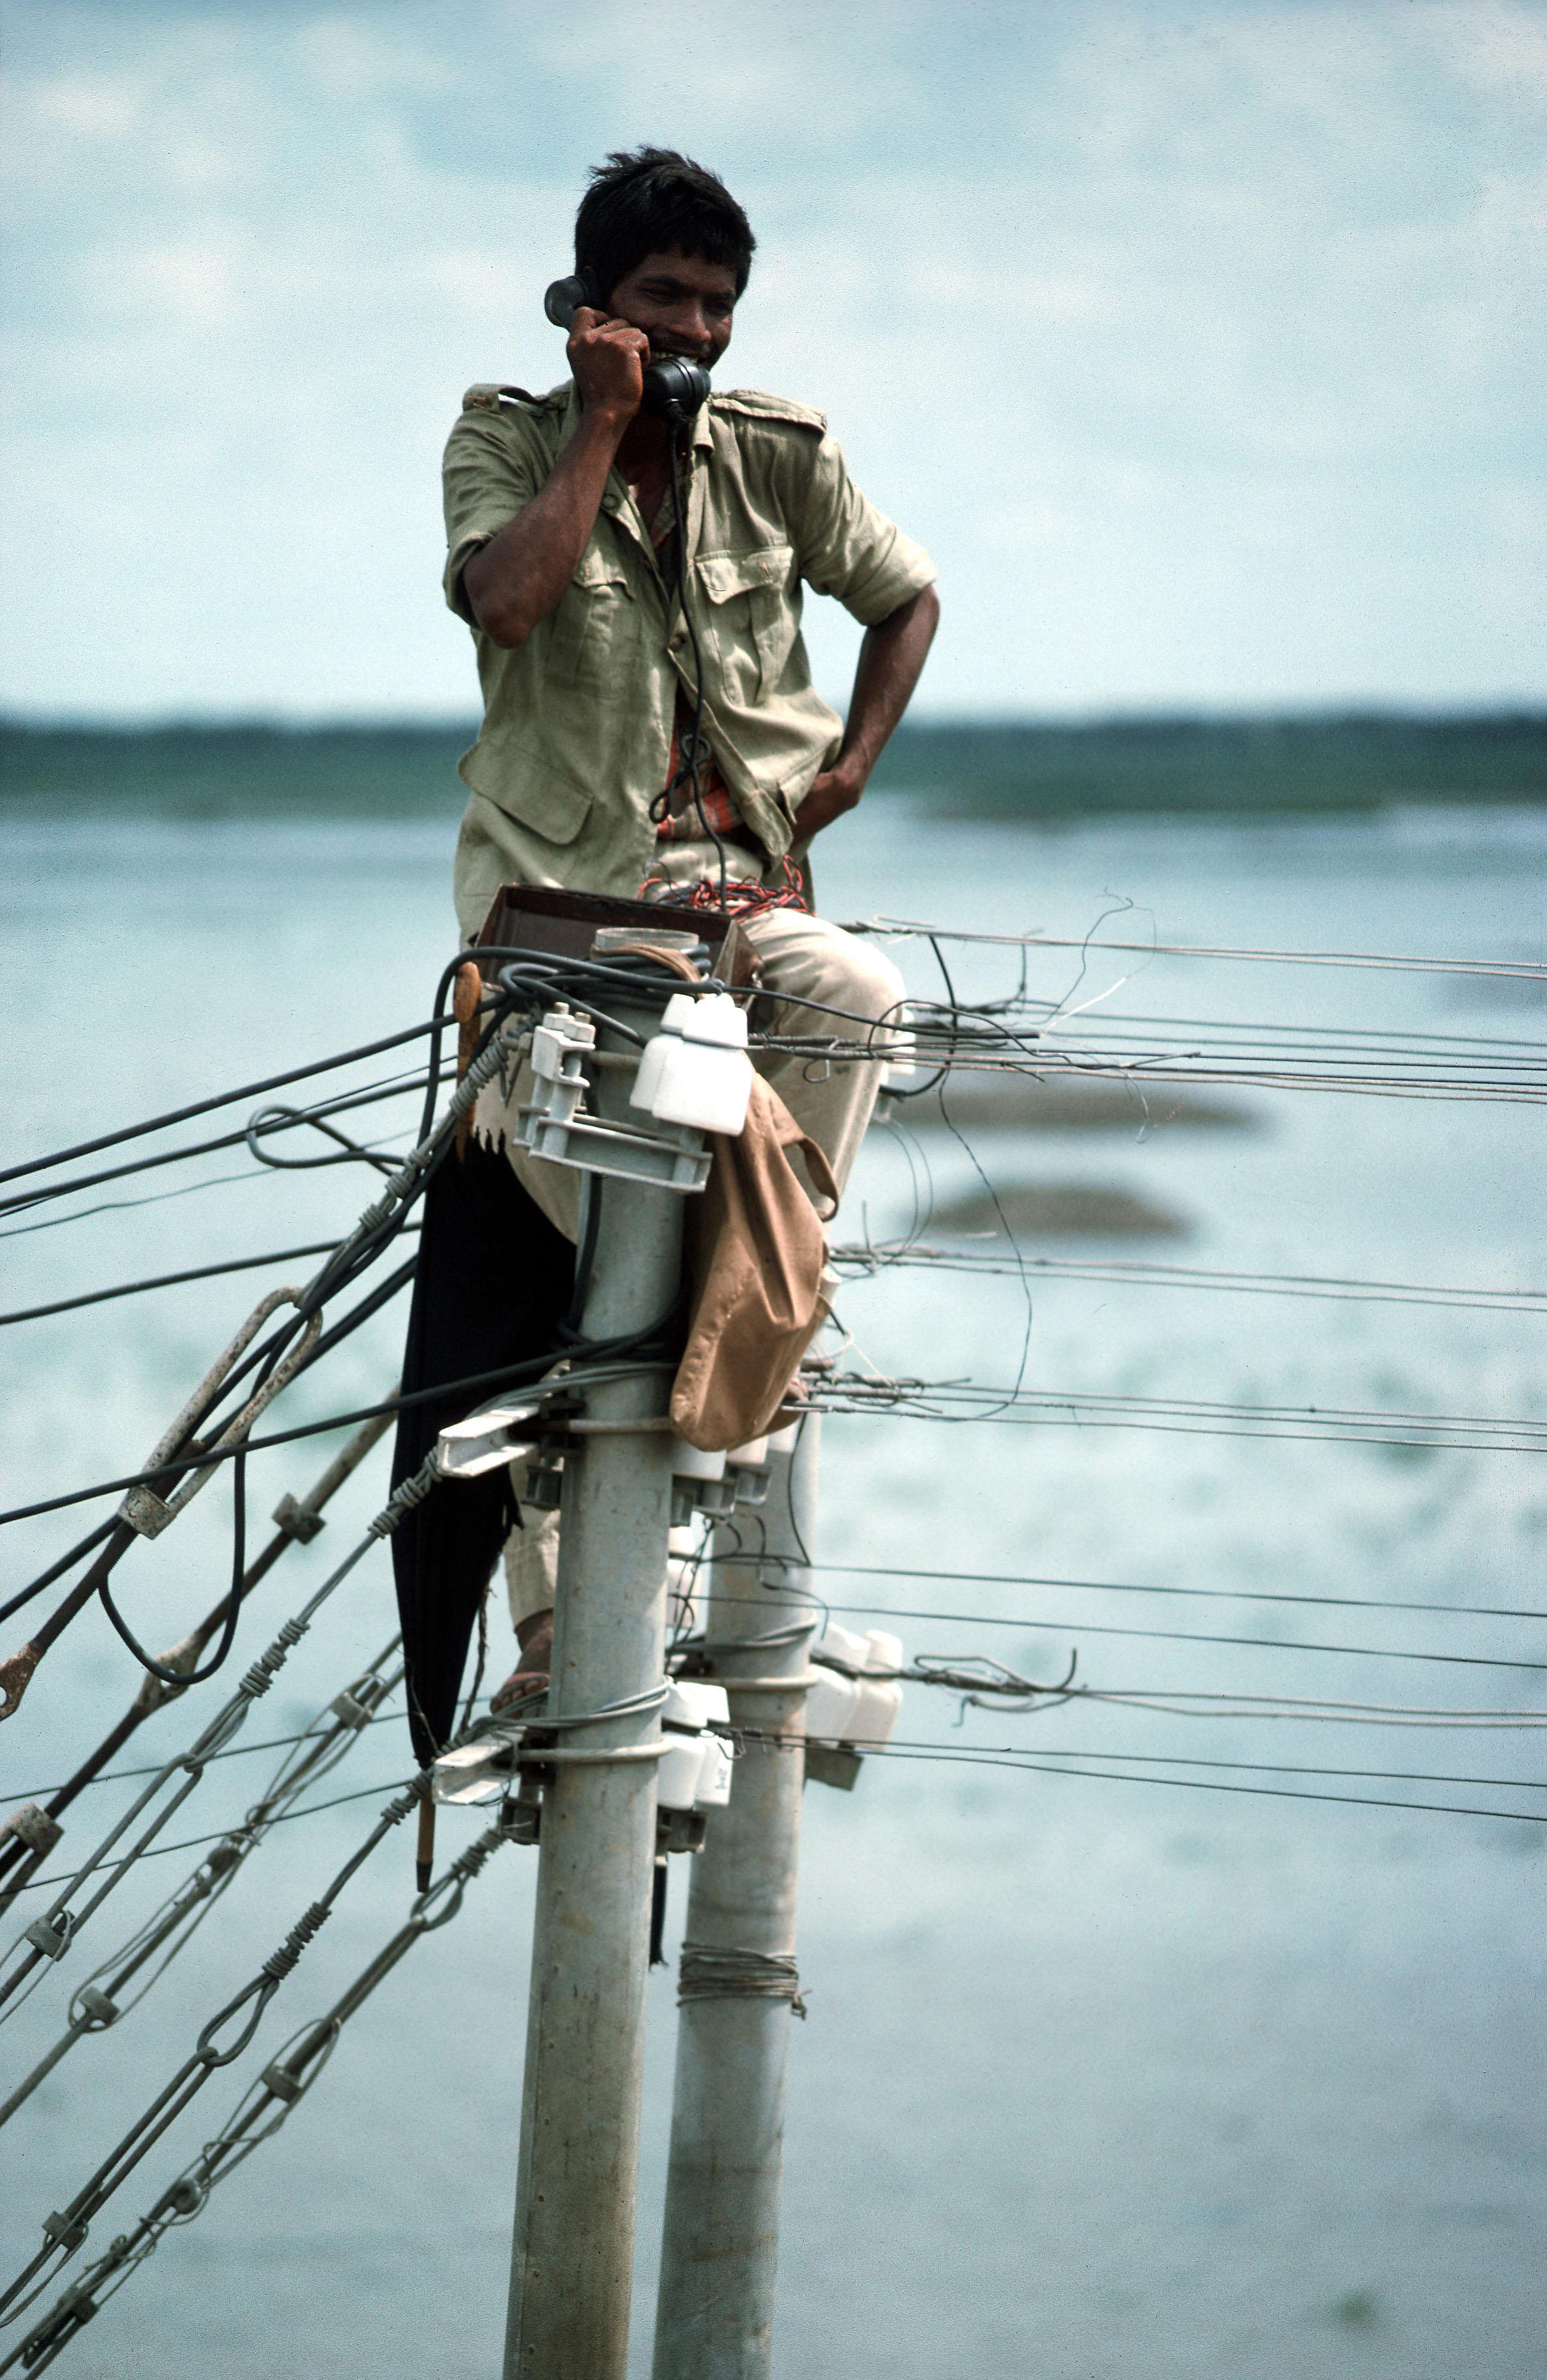 File:Telephone technician checking lines. Savar region, north of ...